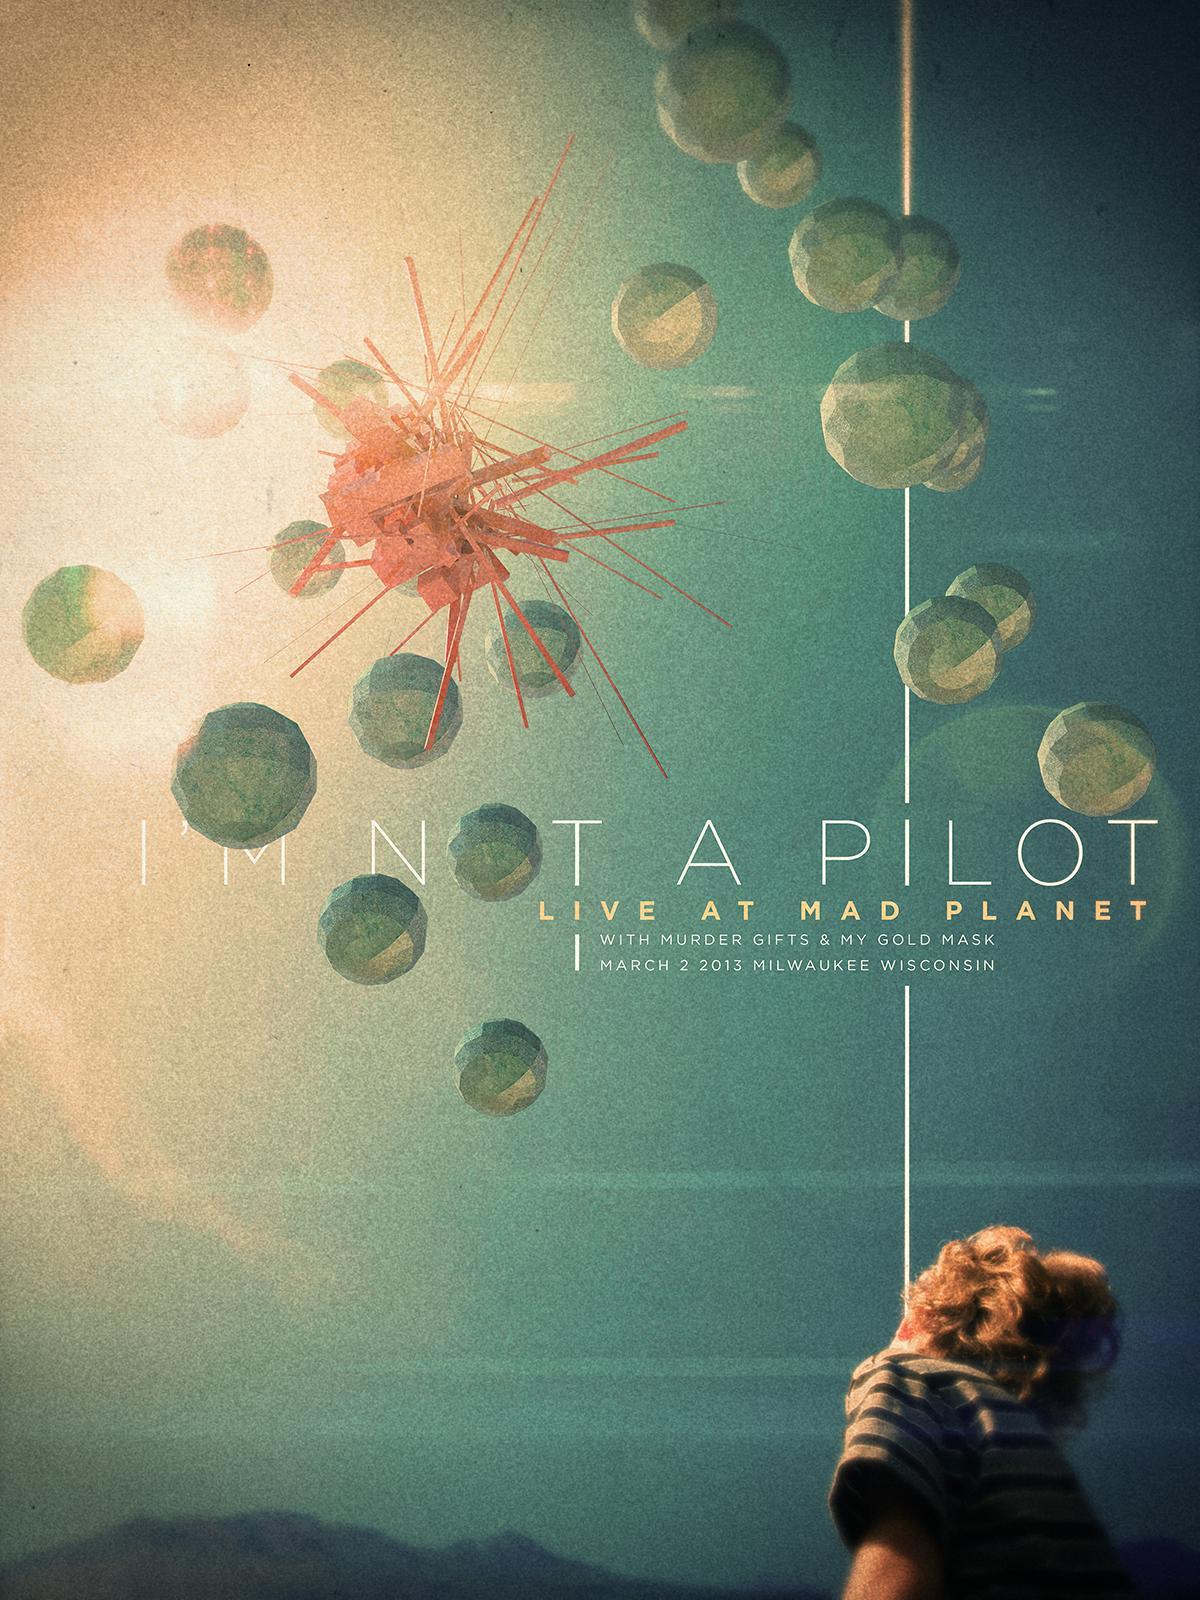 I'm Not a Pilot - Commemorative Show Poster - image 1 - student project